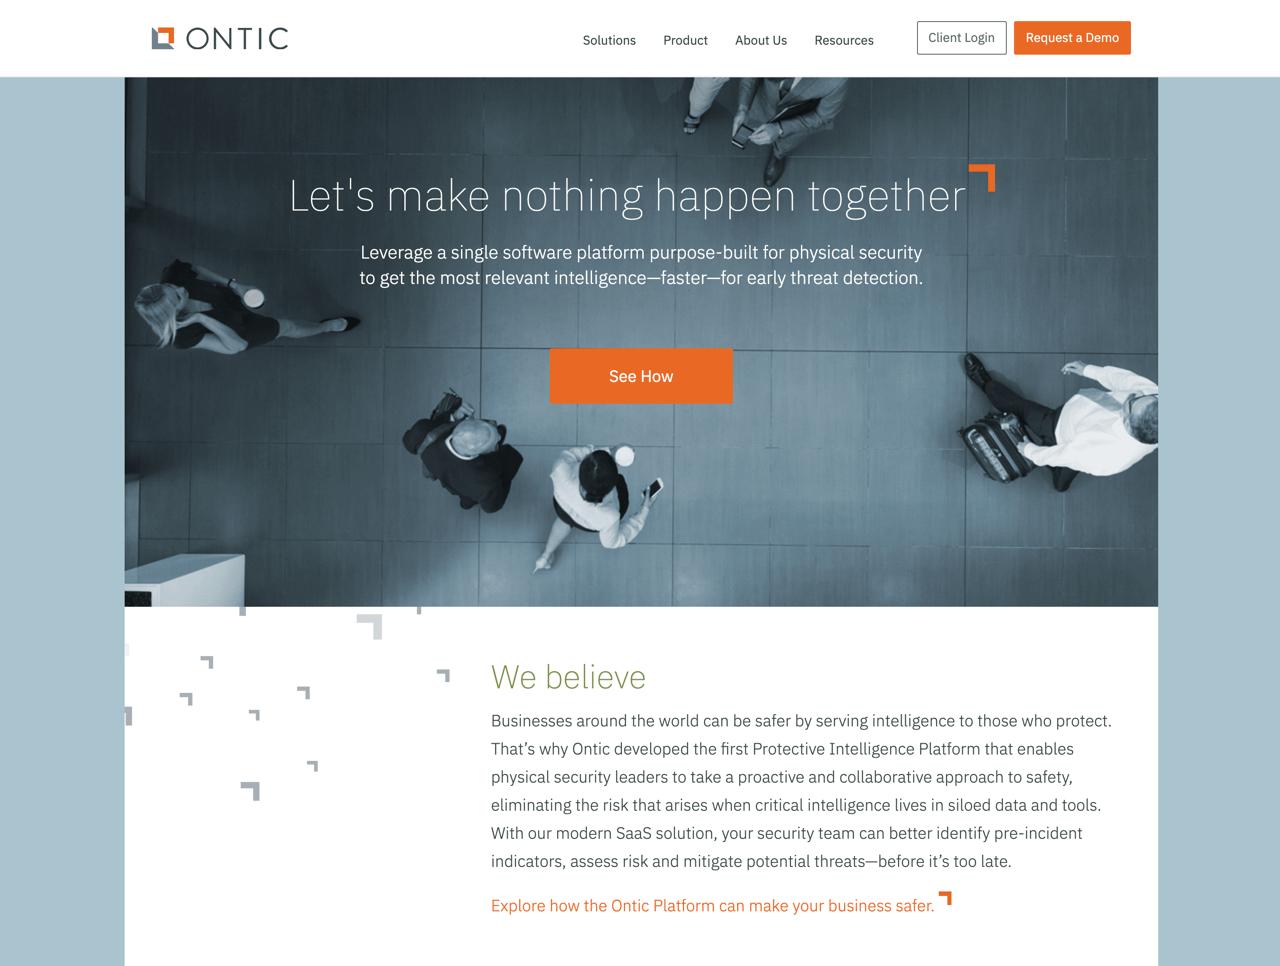 Ontic Technologies